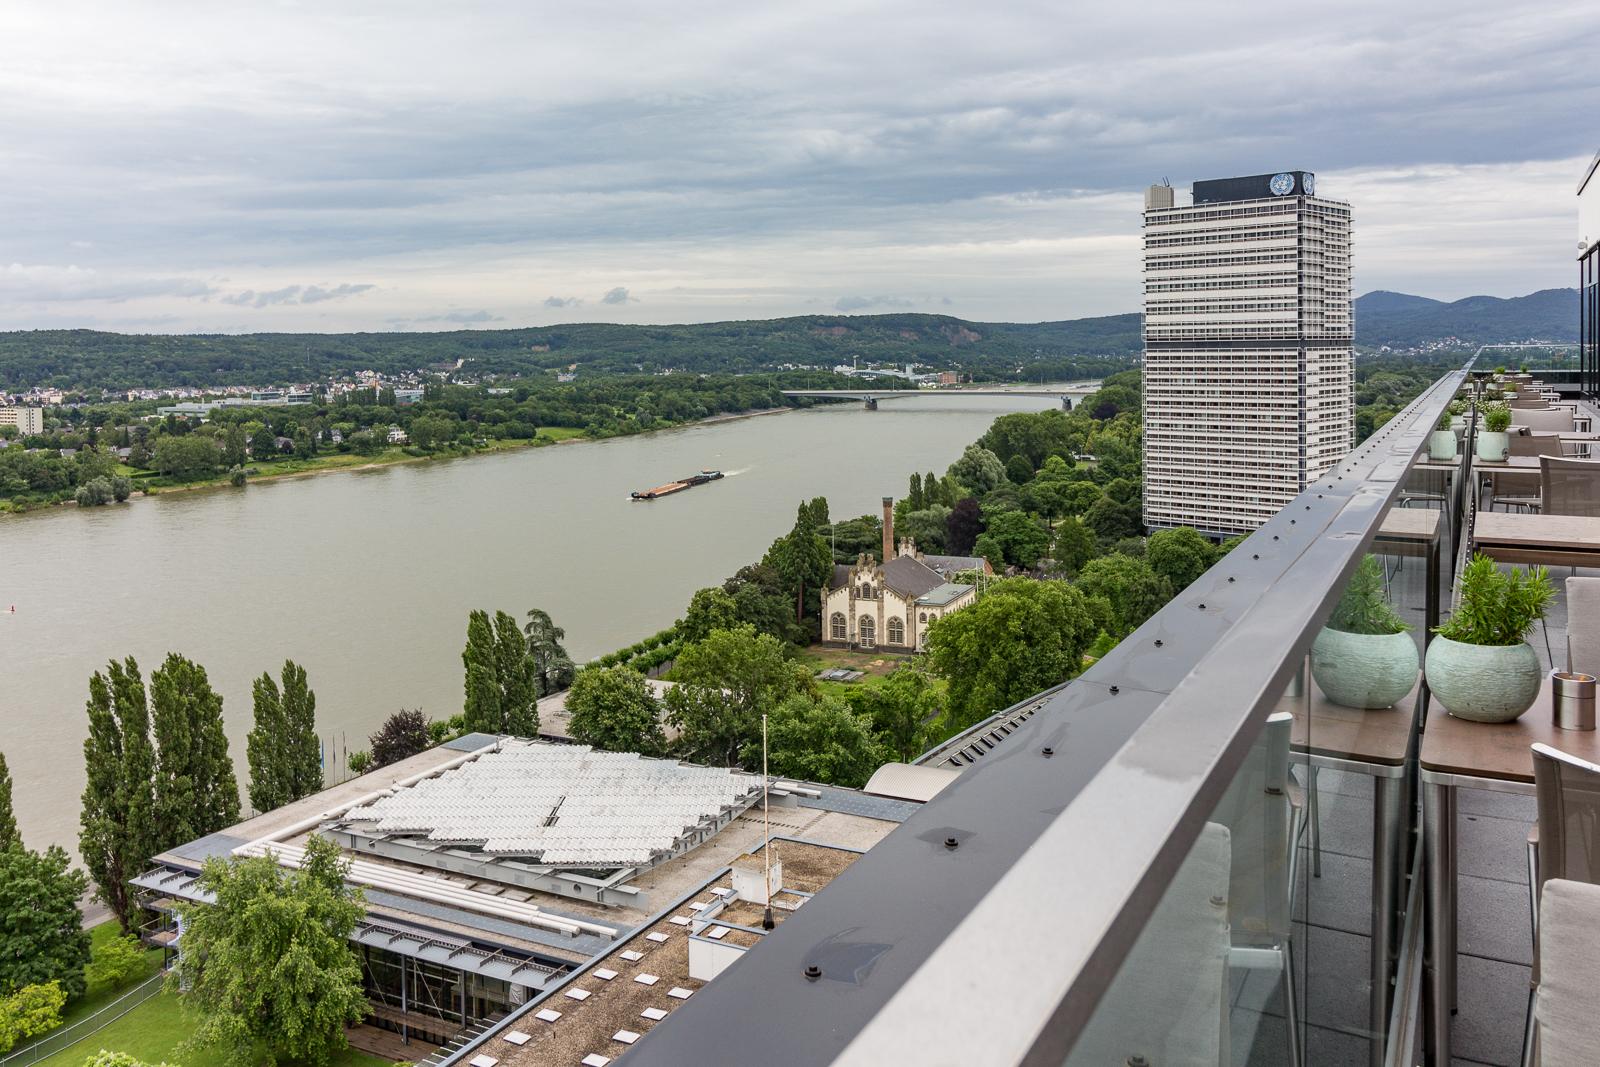 #Rheingenuss, Rhein, Bonn, Marriott